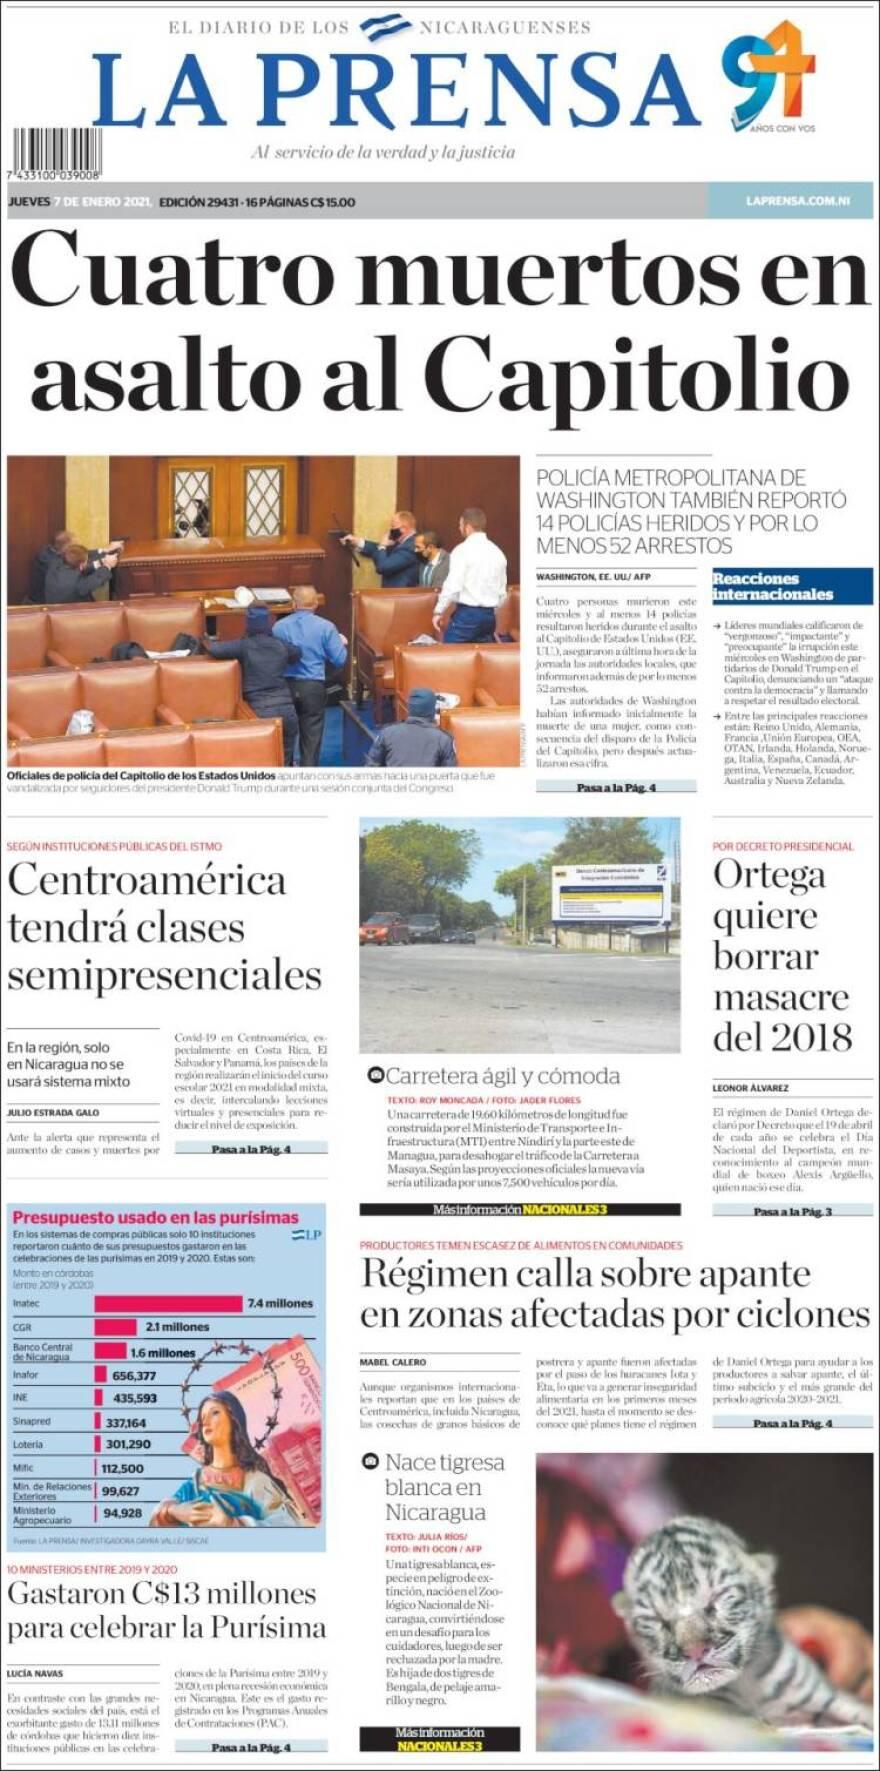 La Prensa Nicaragua.jpg